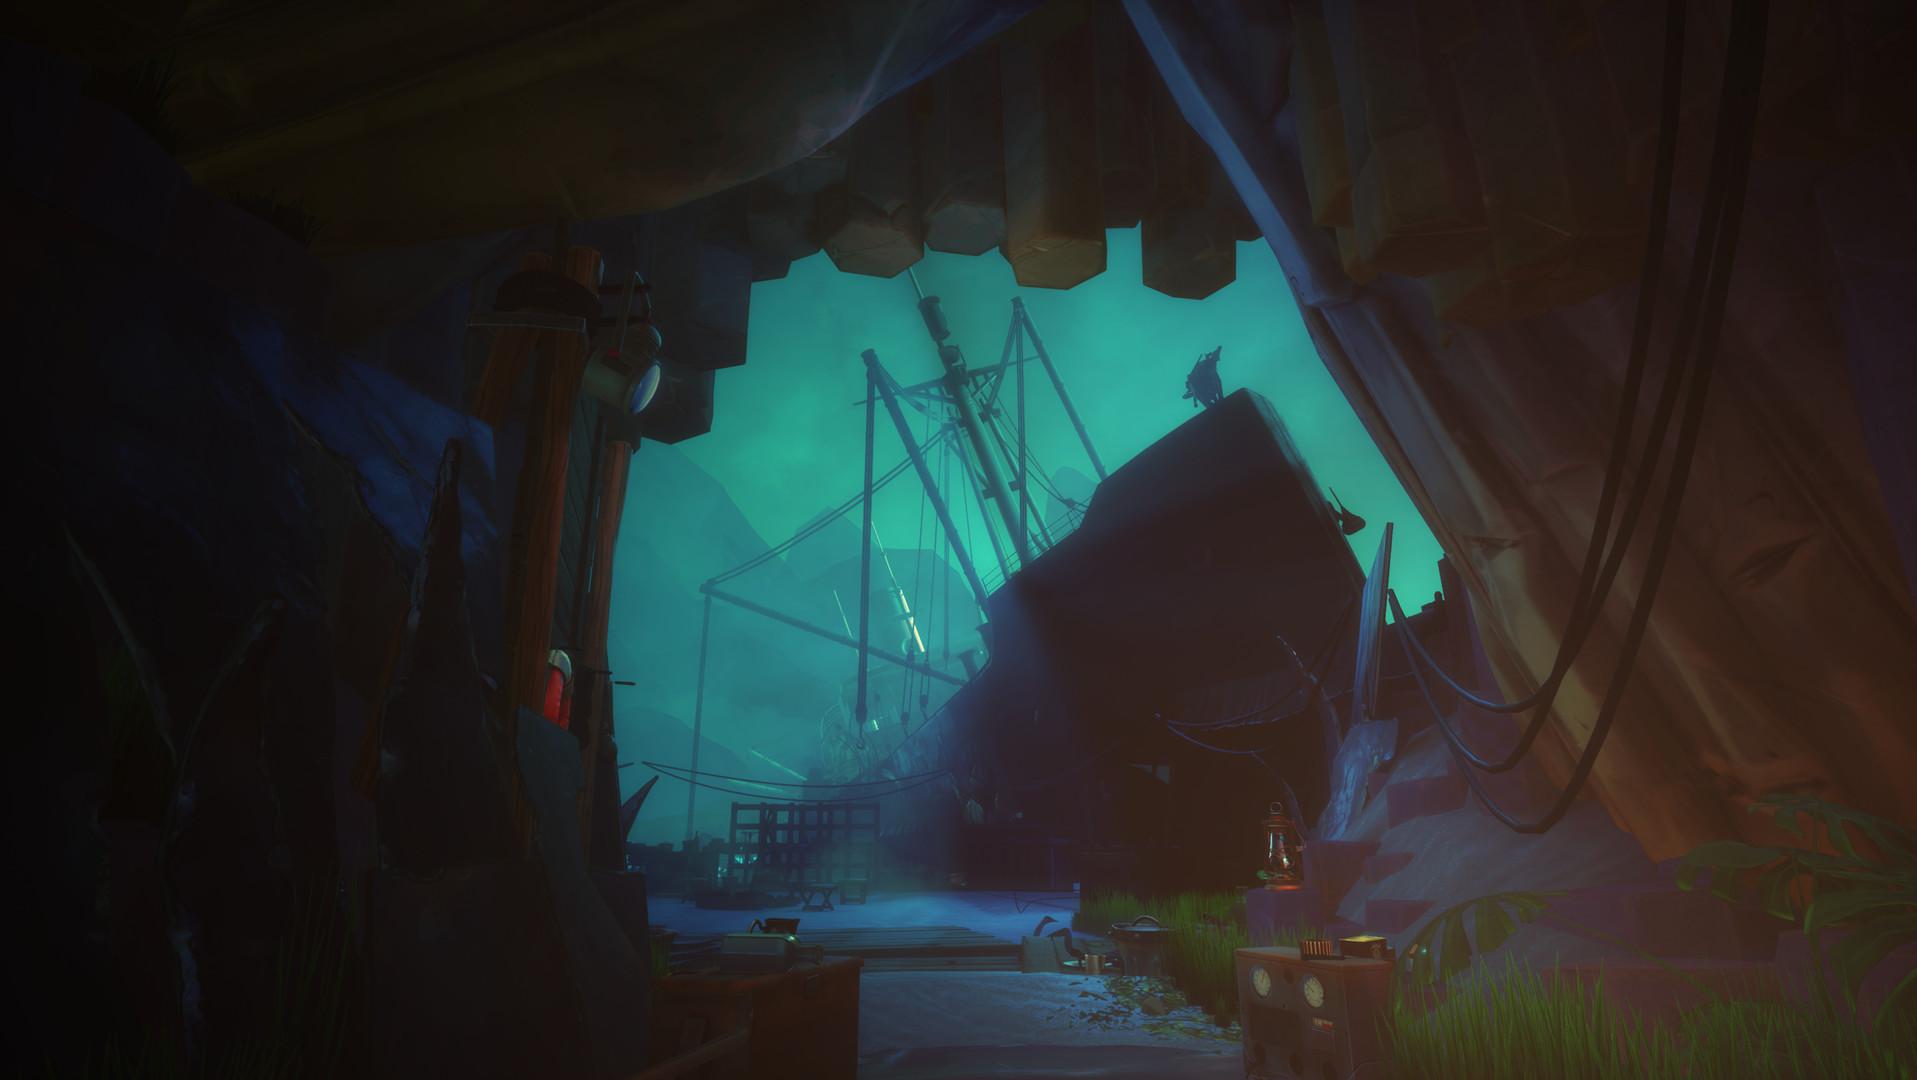 Xboxová exkluzivita Call of the Sea vyjde začátkem prosince